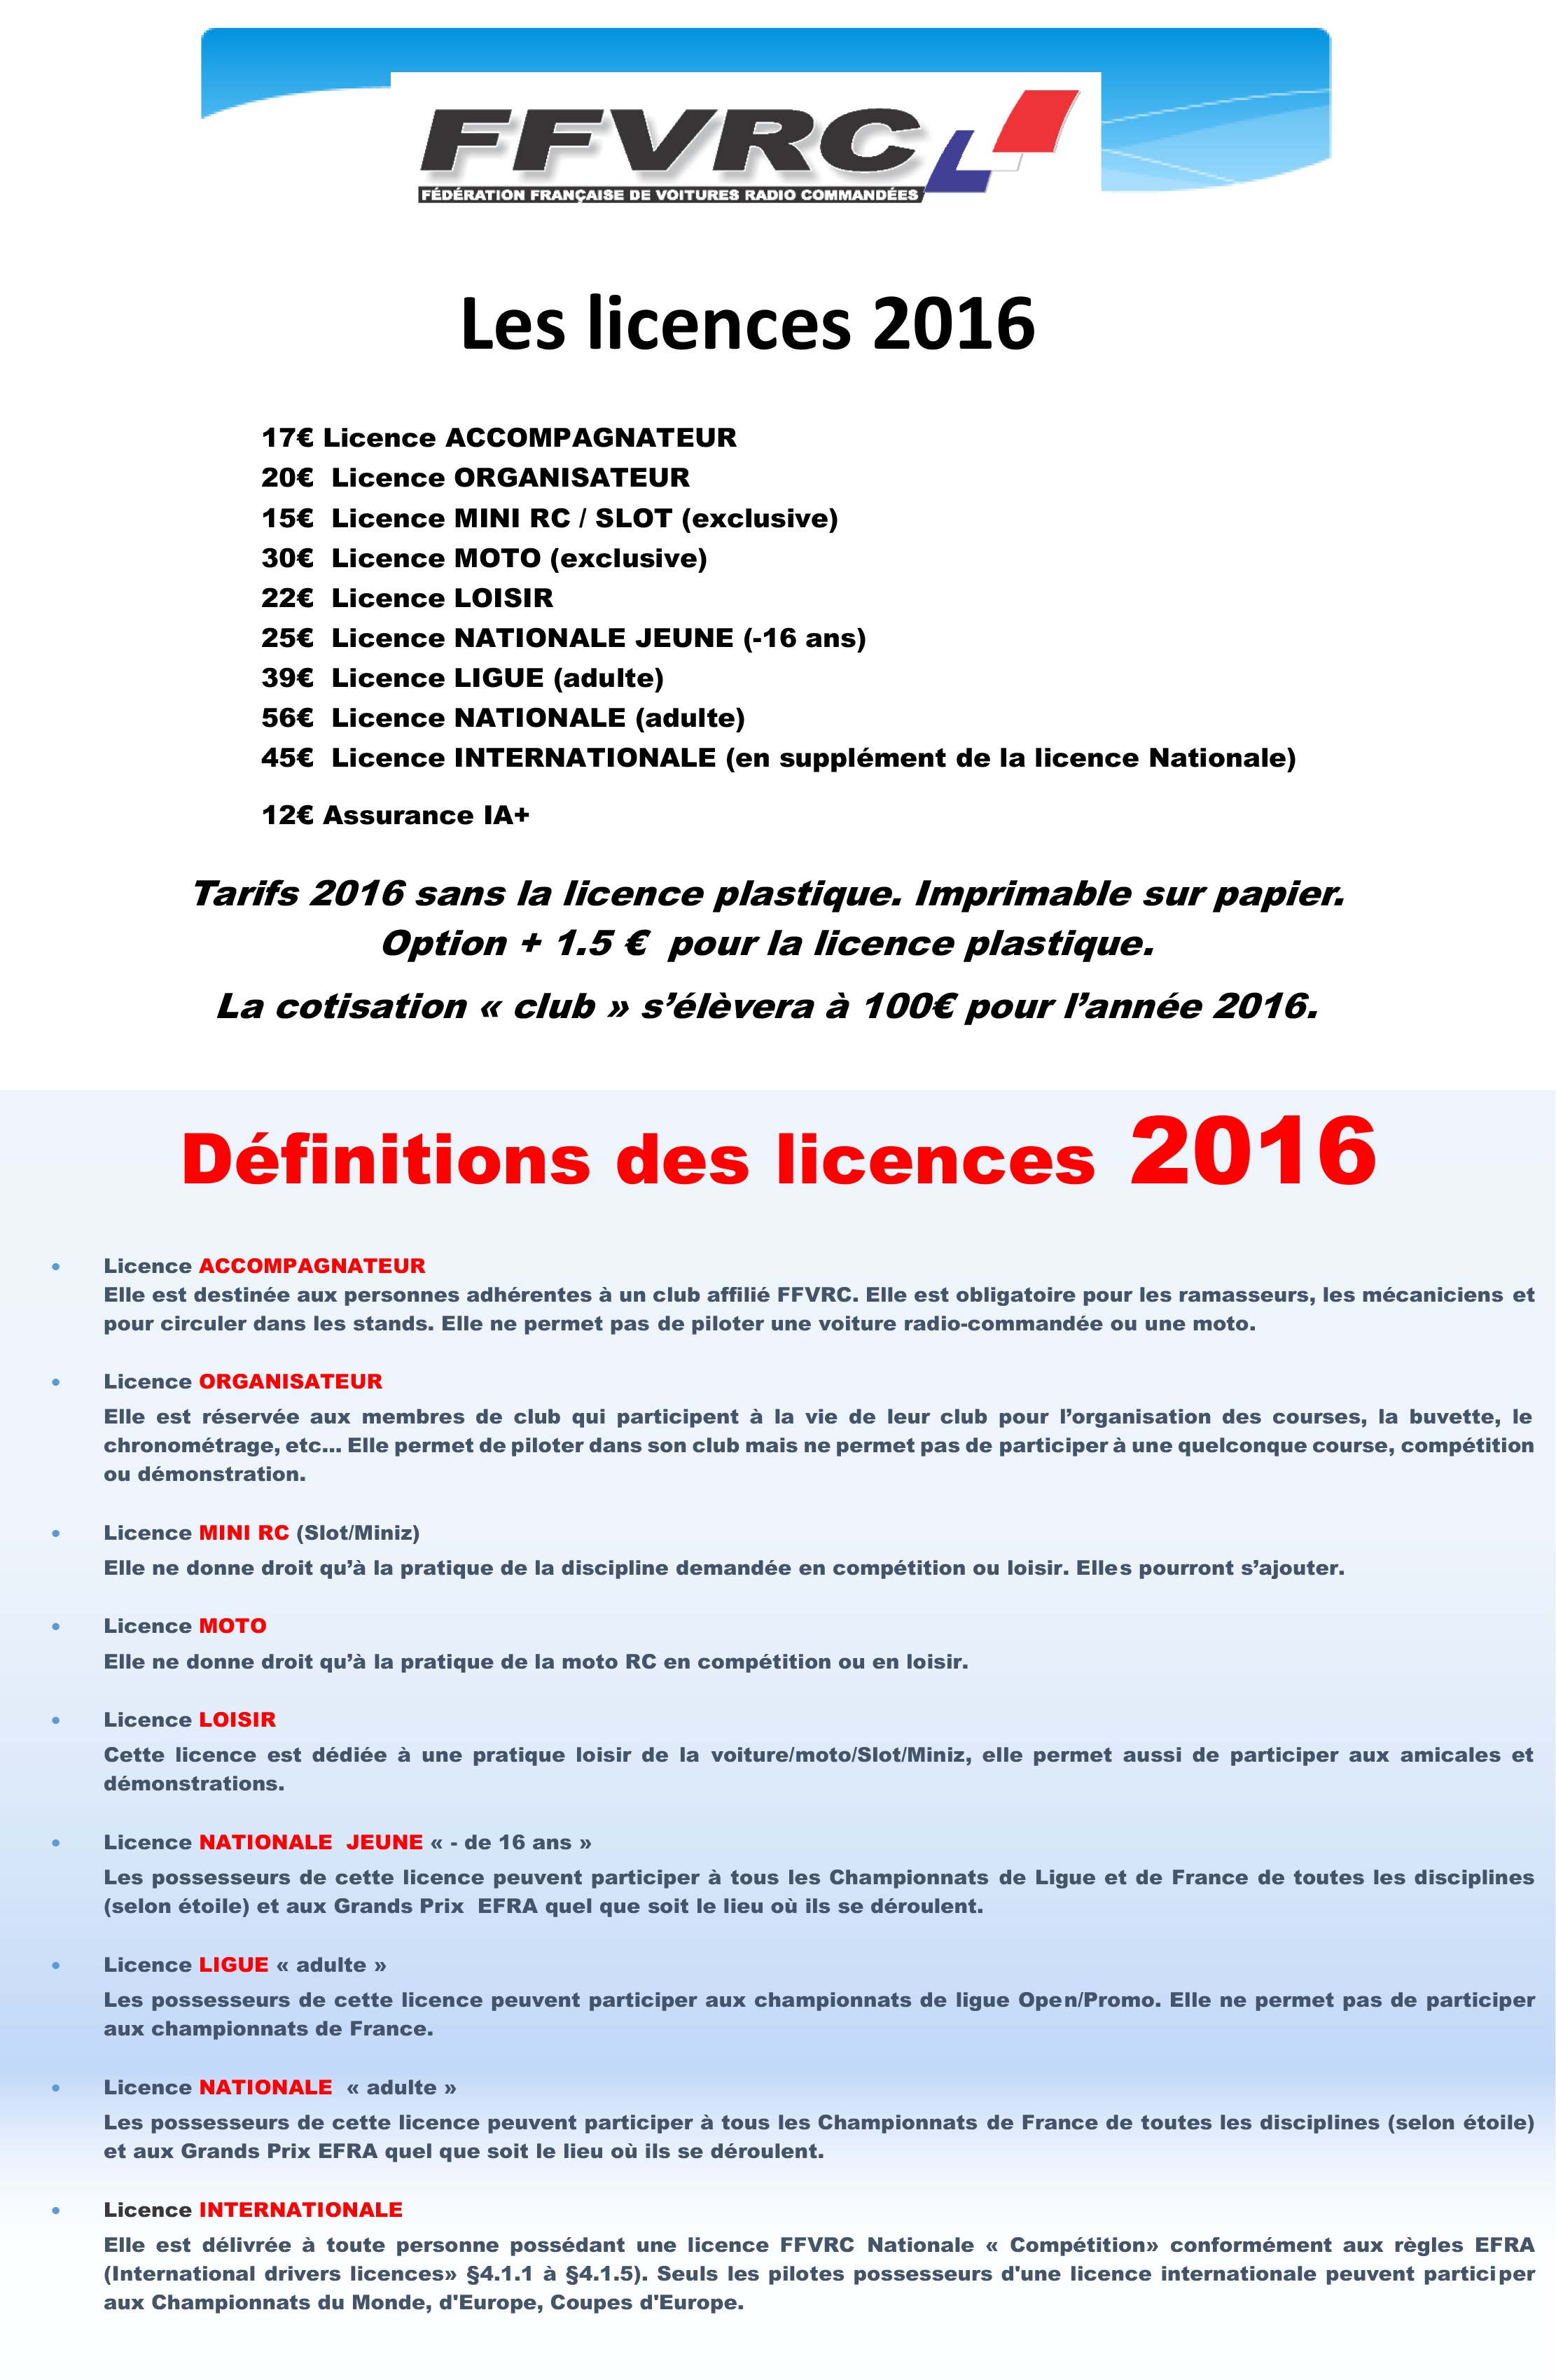 Tarifs licences 2016